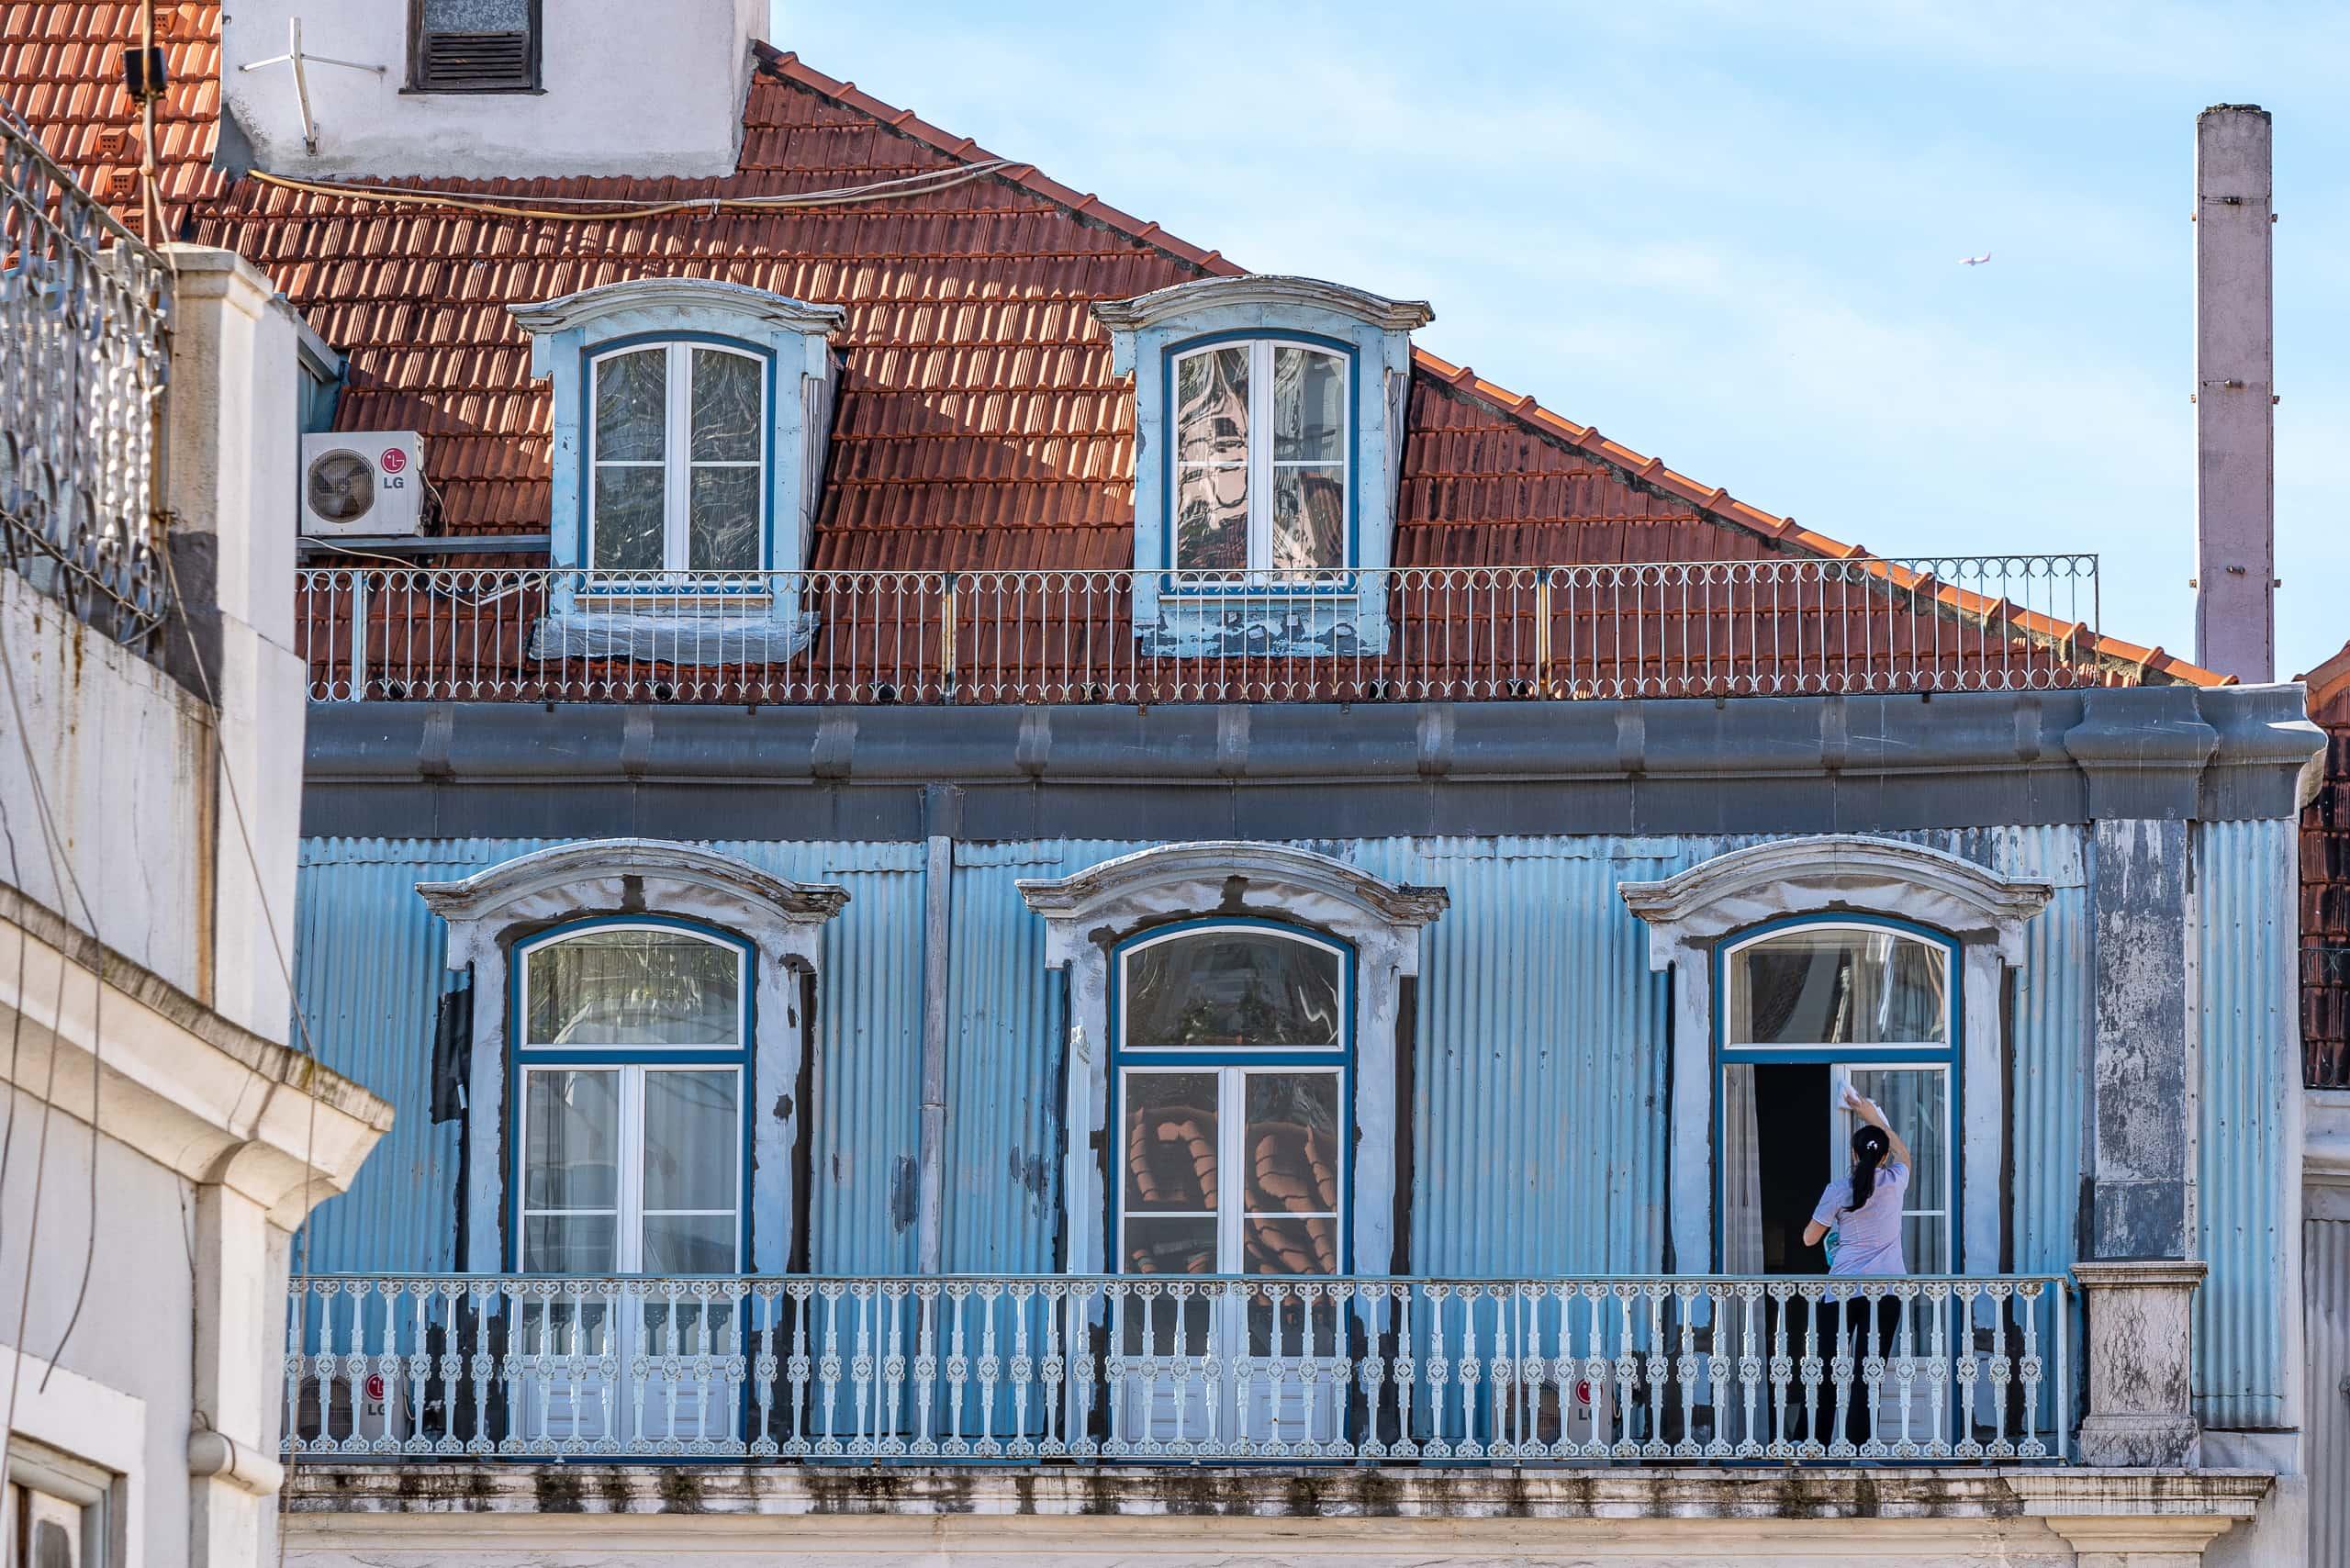 Streets of Lisbon #5